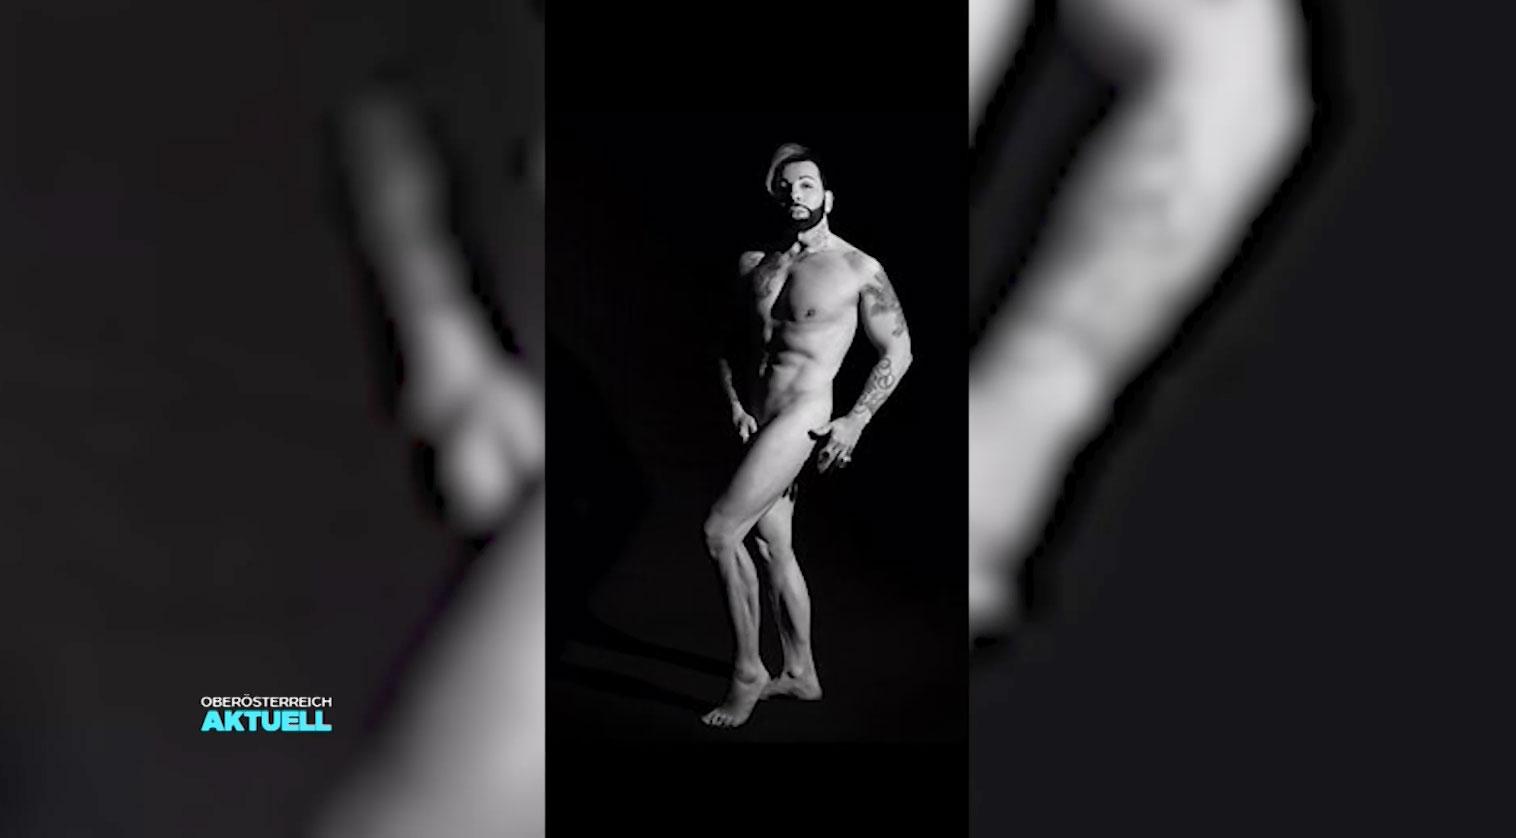 Marcel hirscher nackt